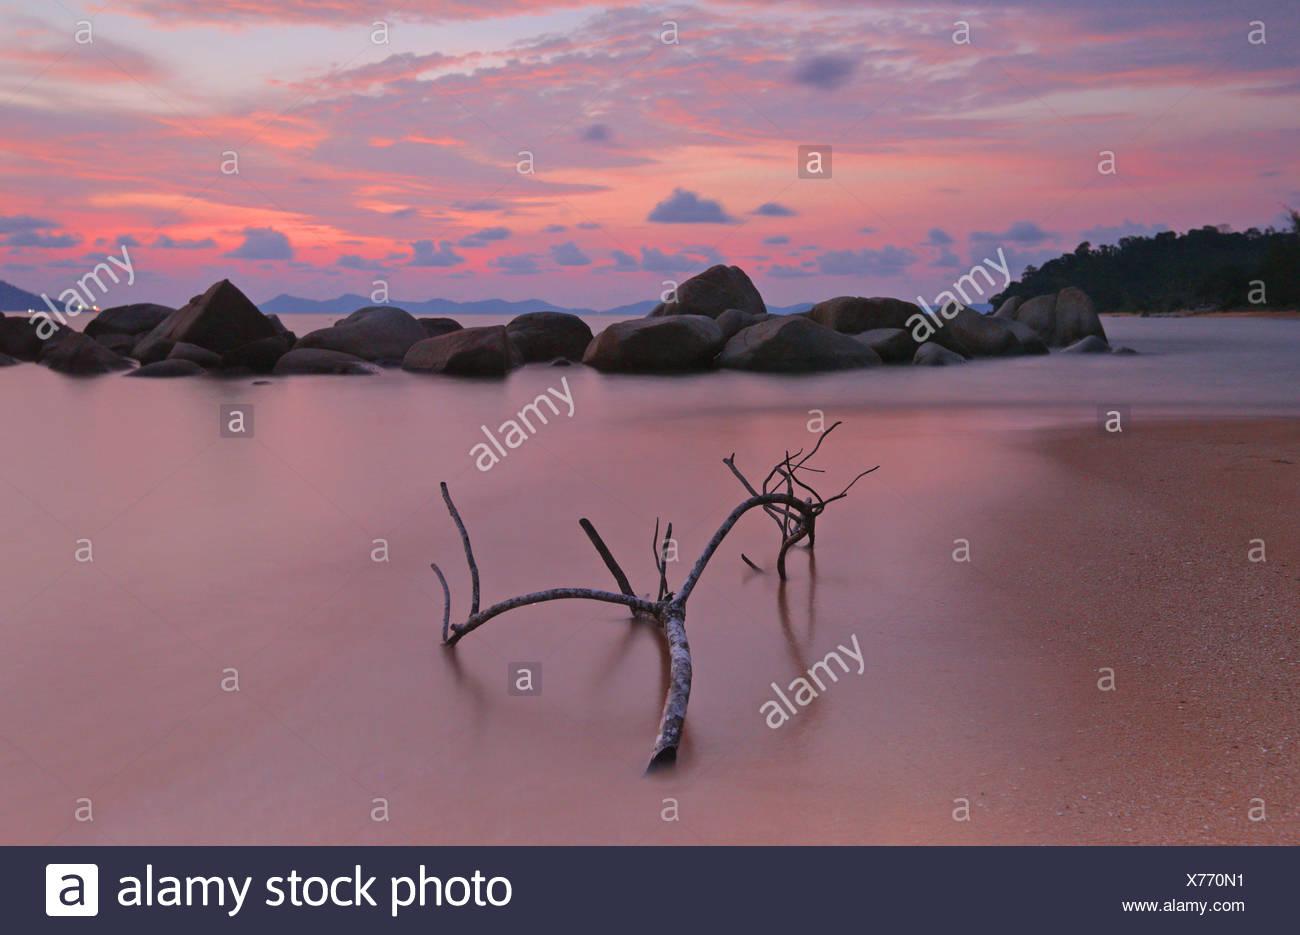 L'Indonésie, Singkawang, Kura Kura plage au coucher du soleil Photo Stock